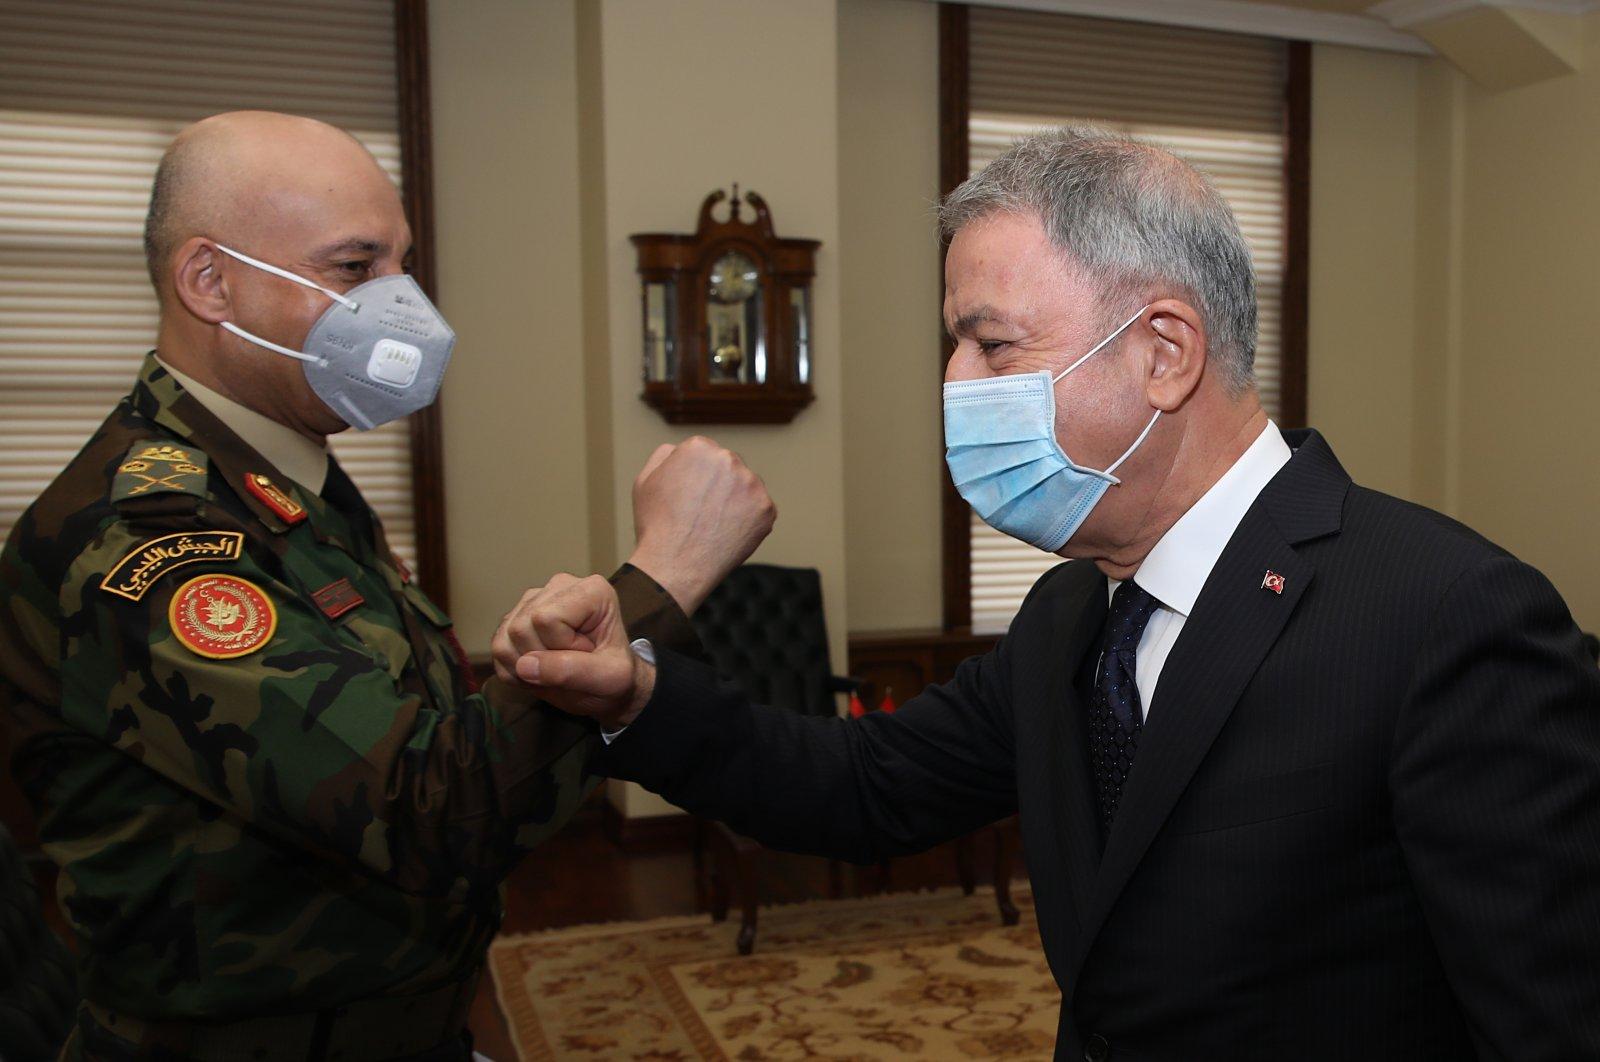 Defense Minister Hulusi Akar receives Libyan Chief of General Staff Muhammad Ali Ahmad al-Haddad in the capital Ankara, Turkey, Oct. 19, 2020. (AA Photo)